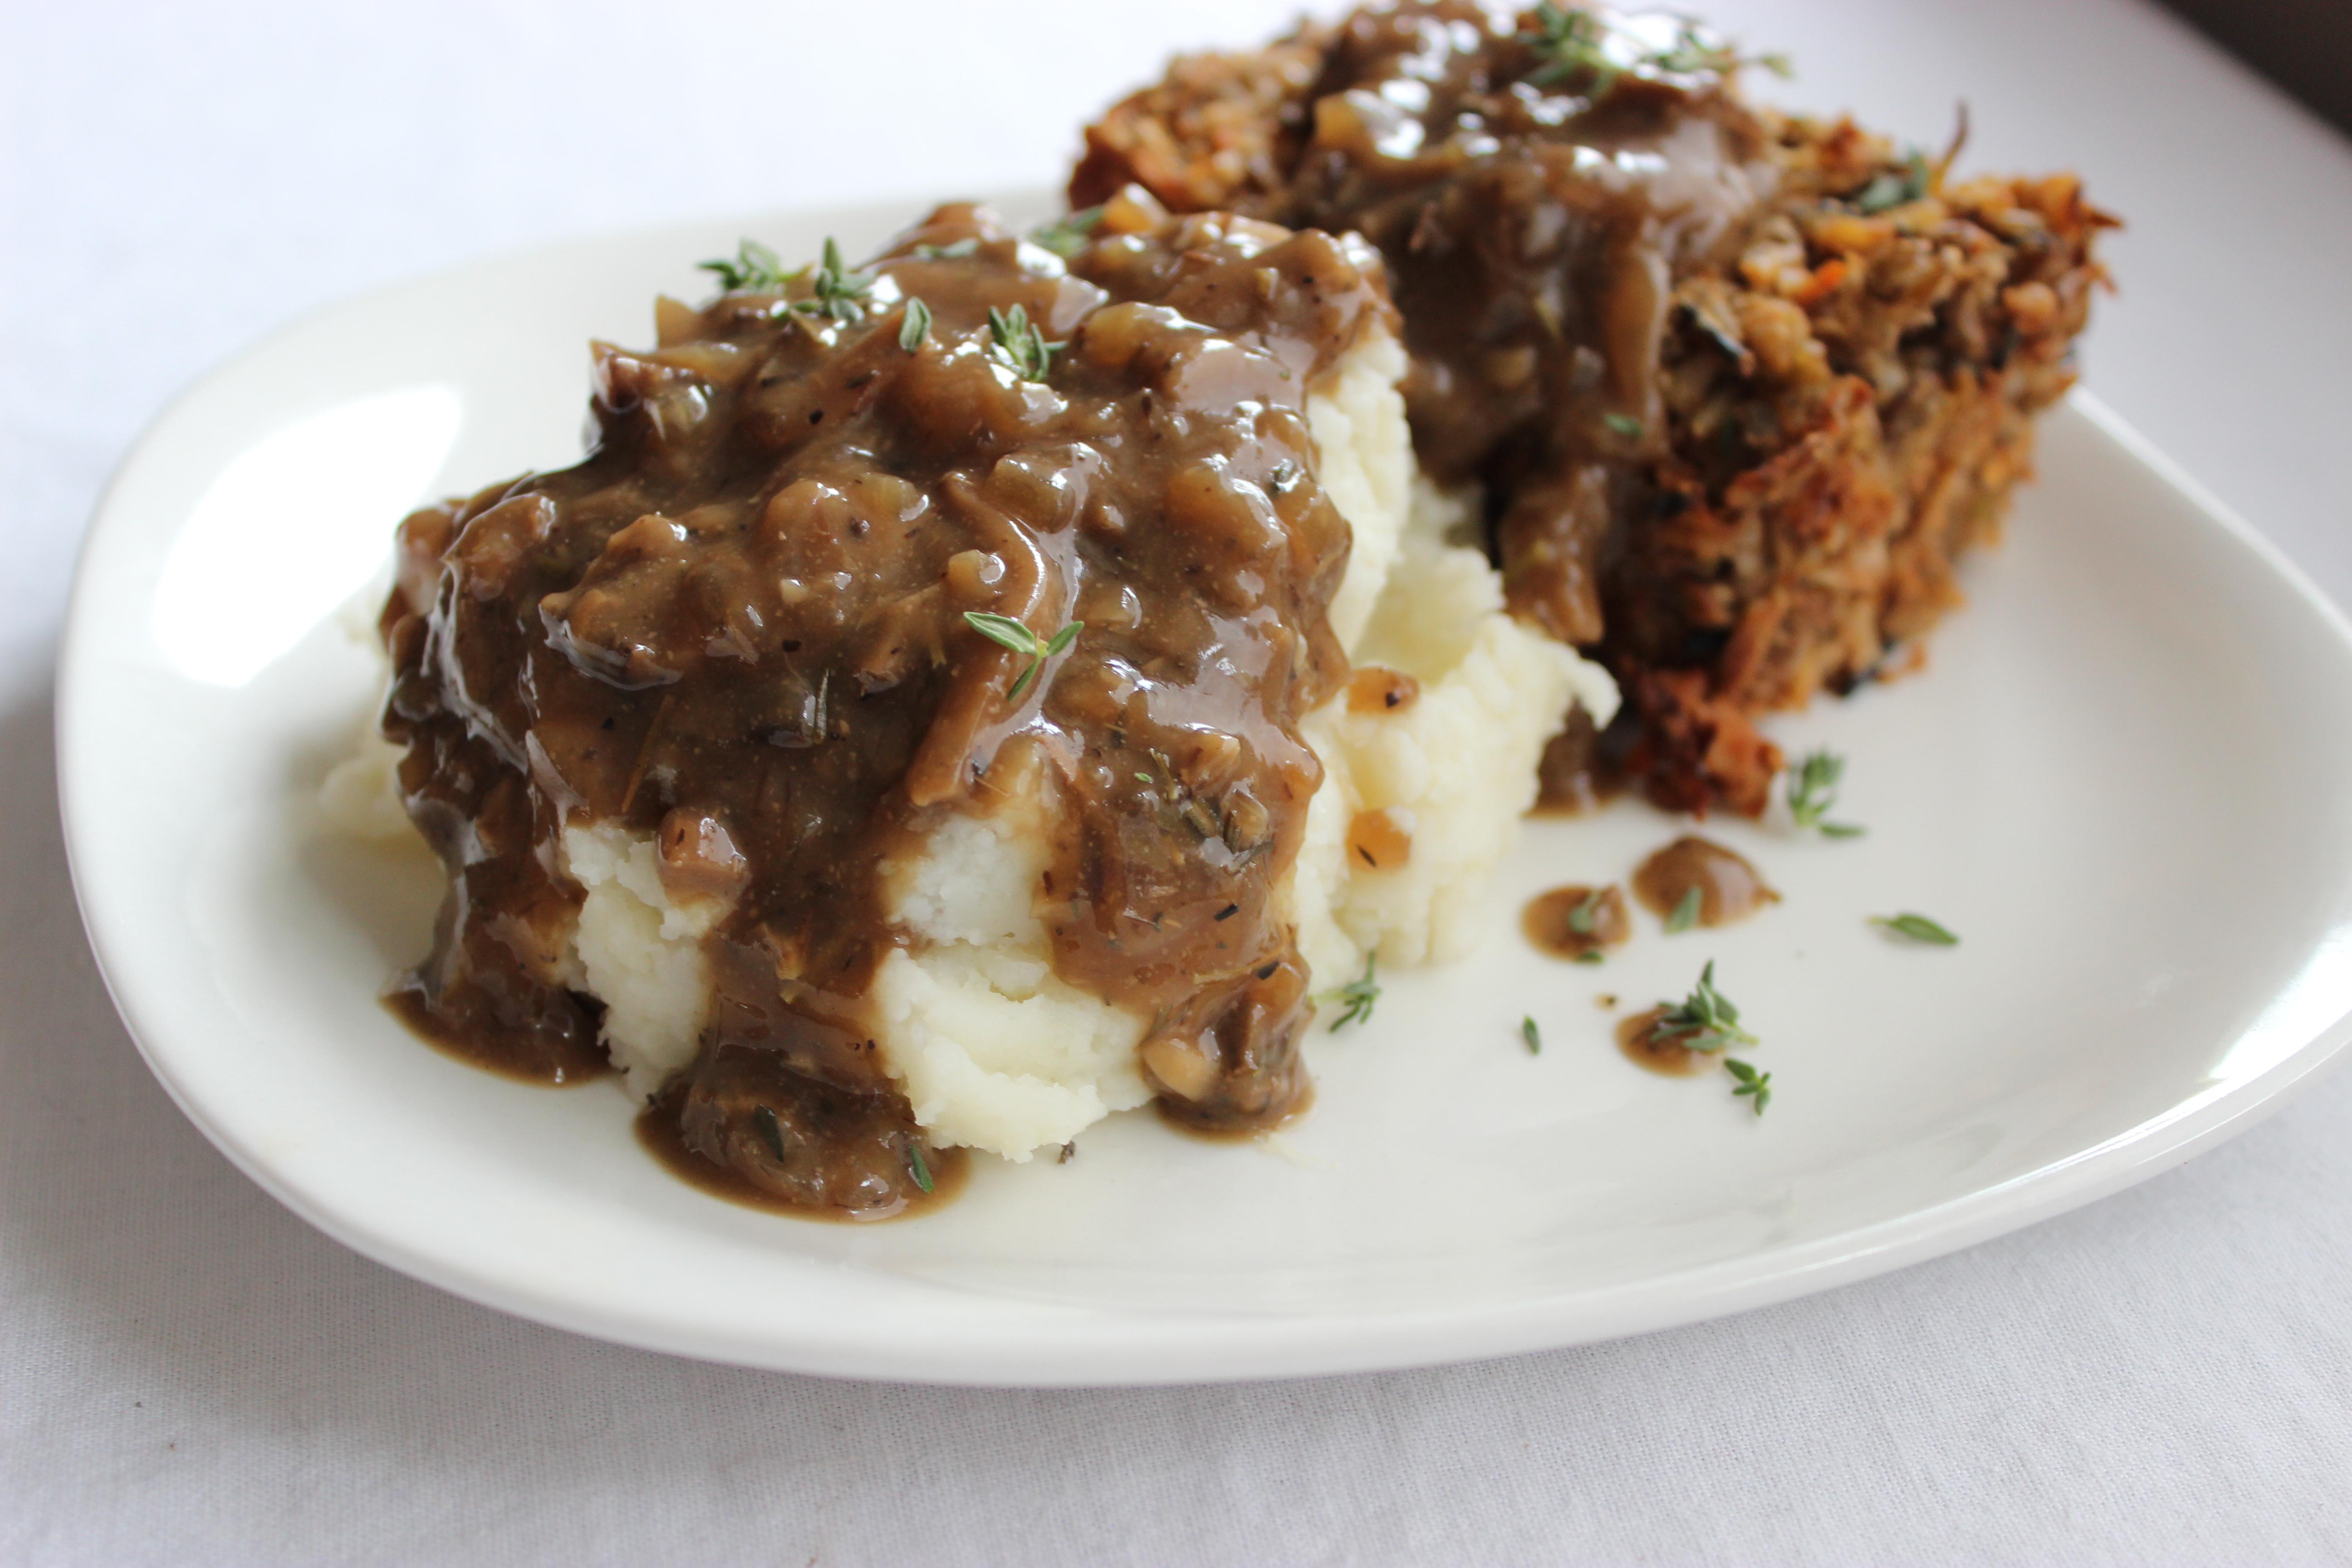 'Beefy' Vegan Mushroom Gravy